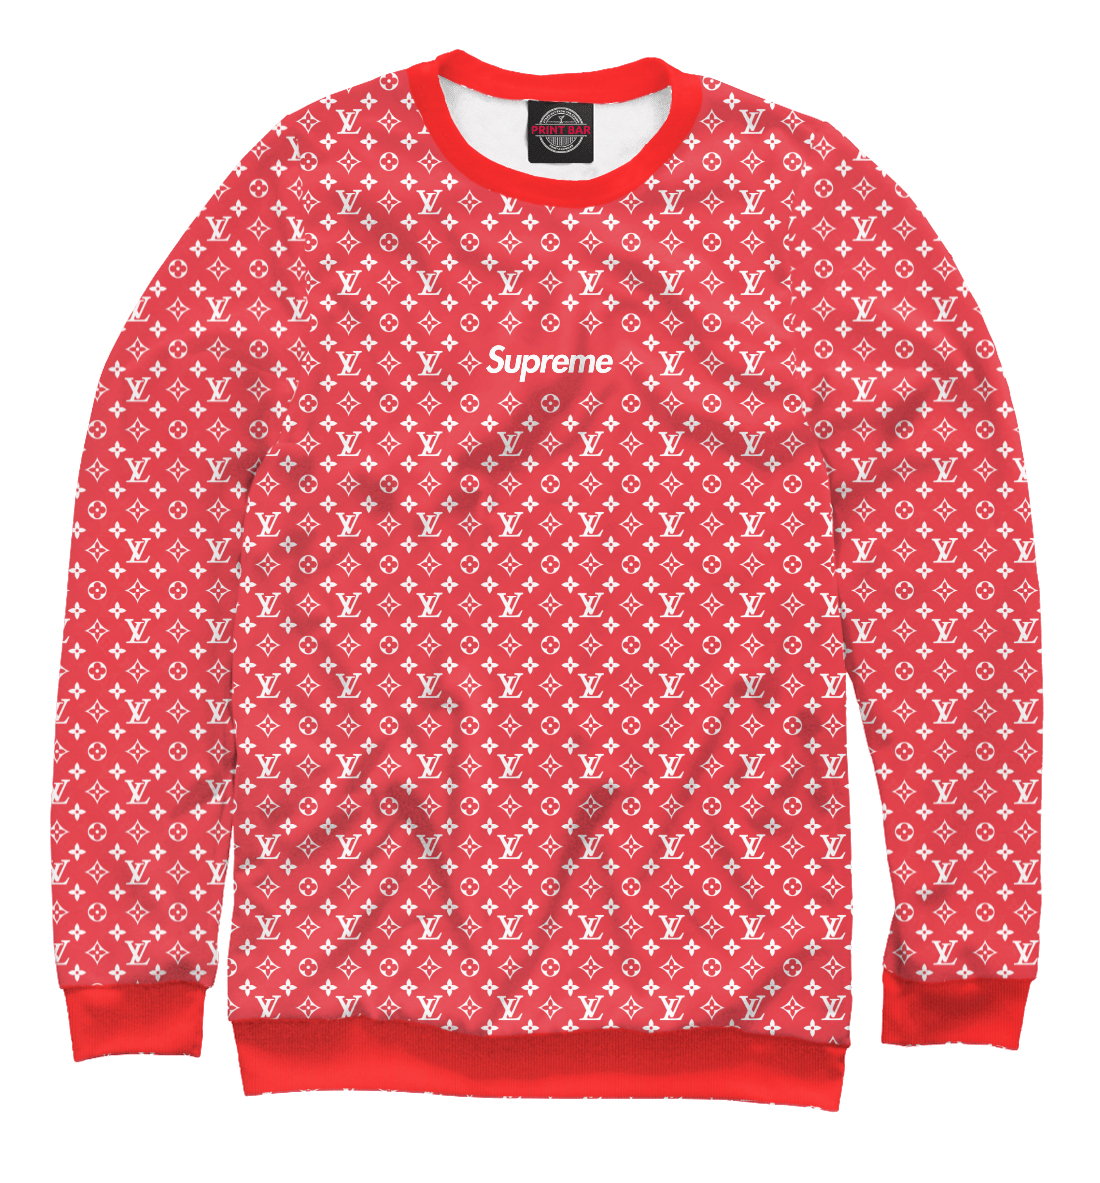 Купить SUPREME Louis Vuitton, Printbar, Свитшоты, SPR-739701-swi-1